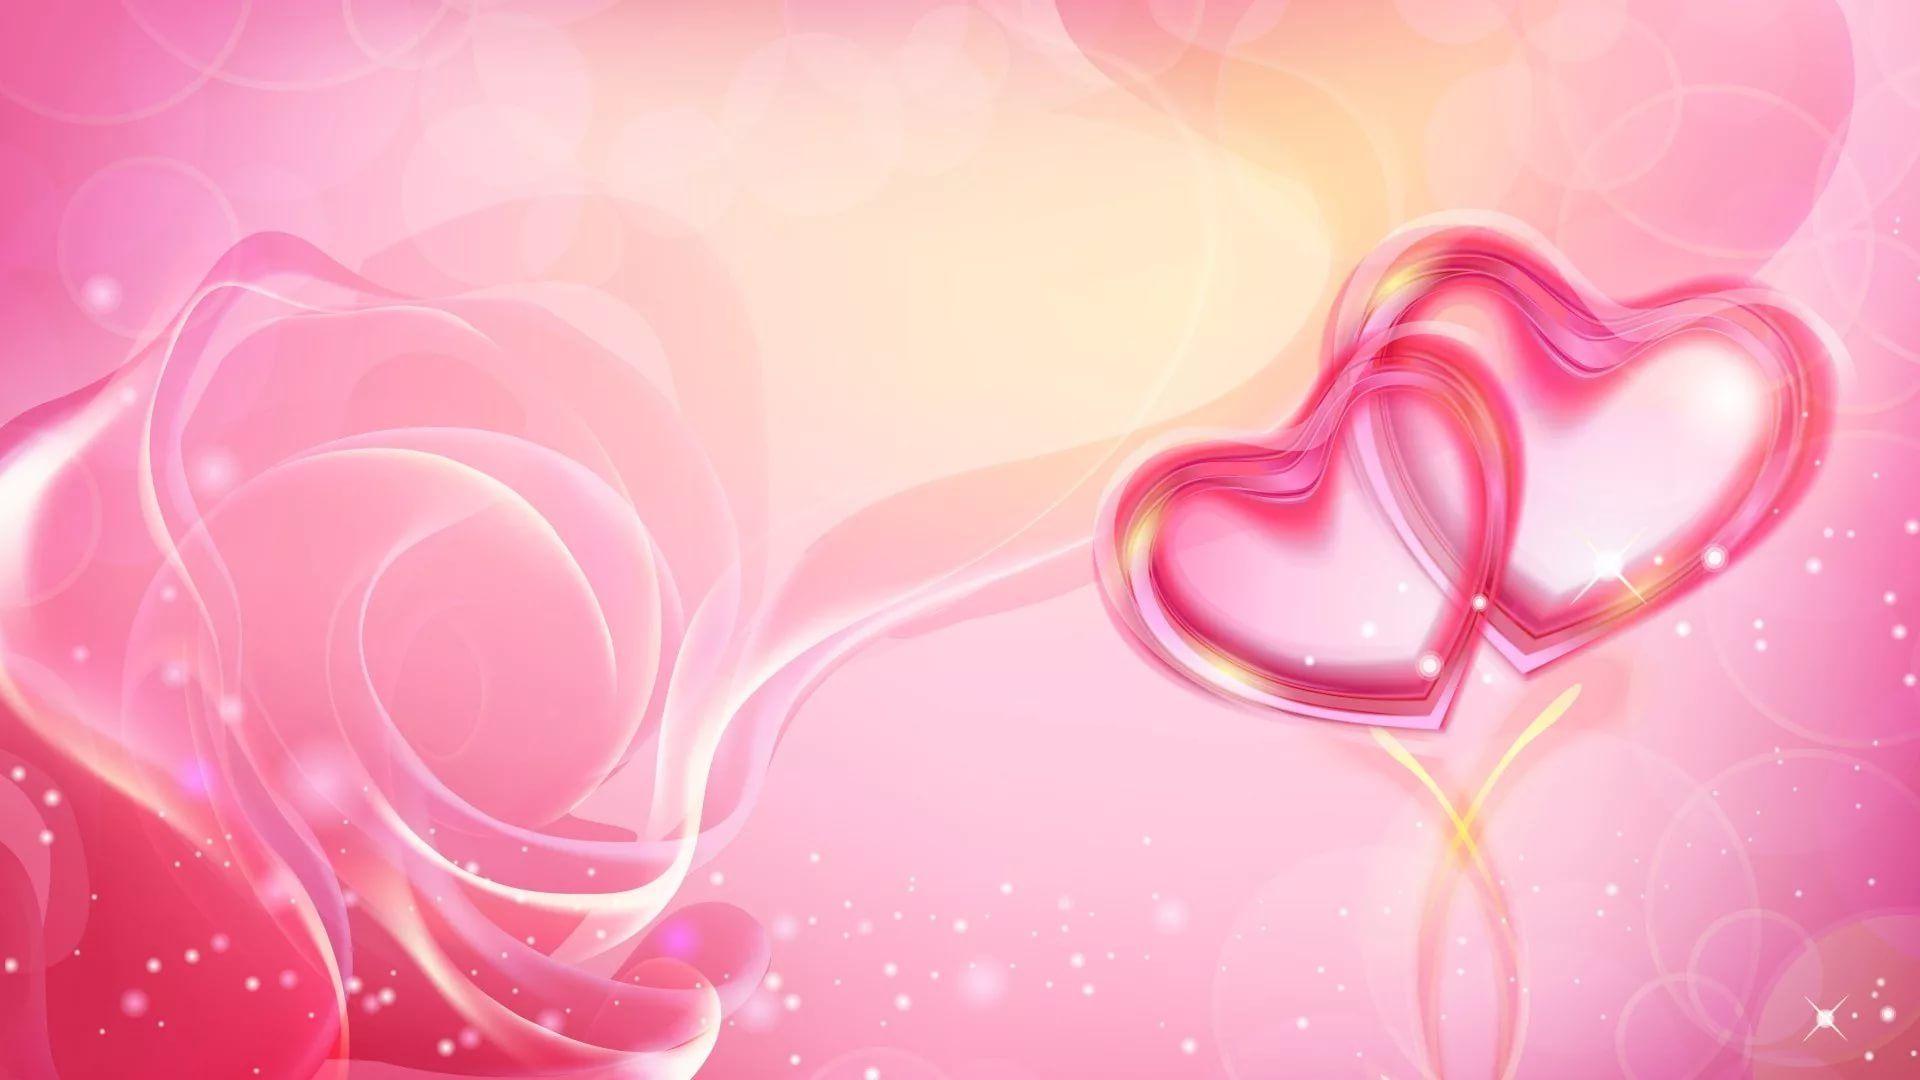 Valentine Screensaver full hd 1080p wallpaper